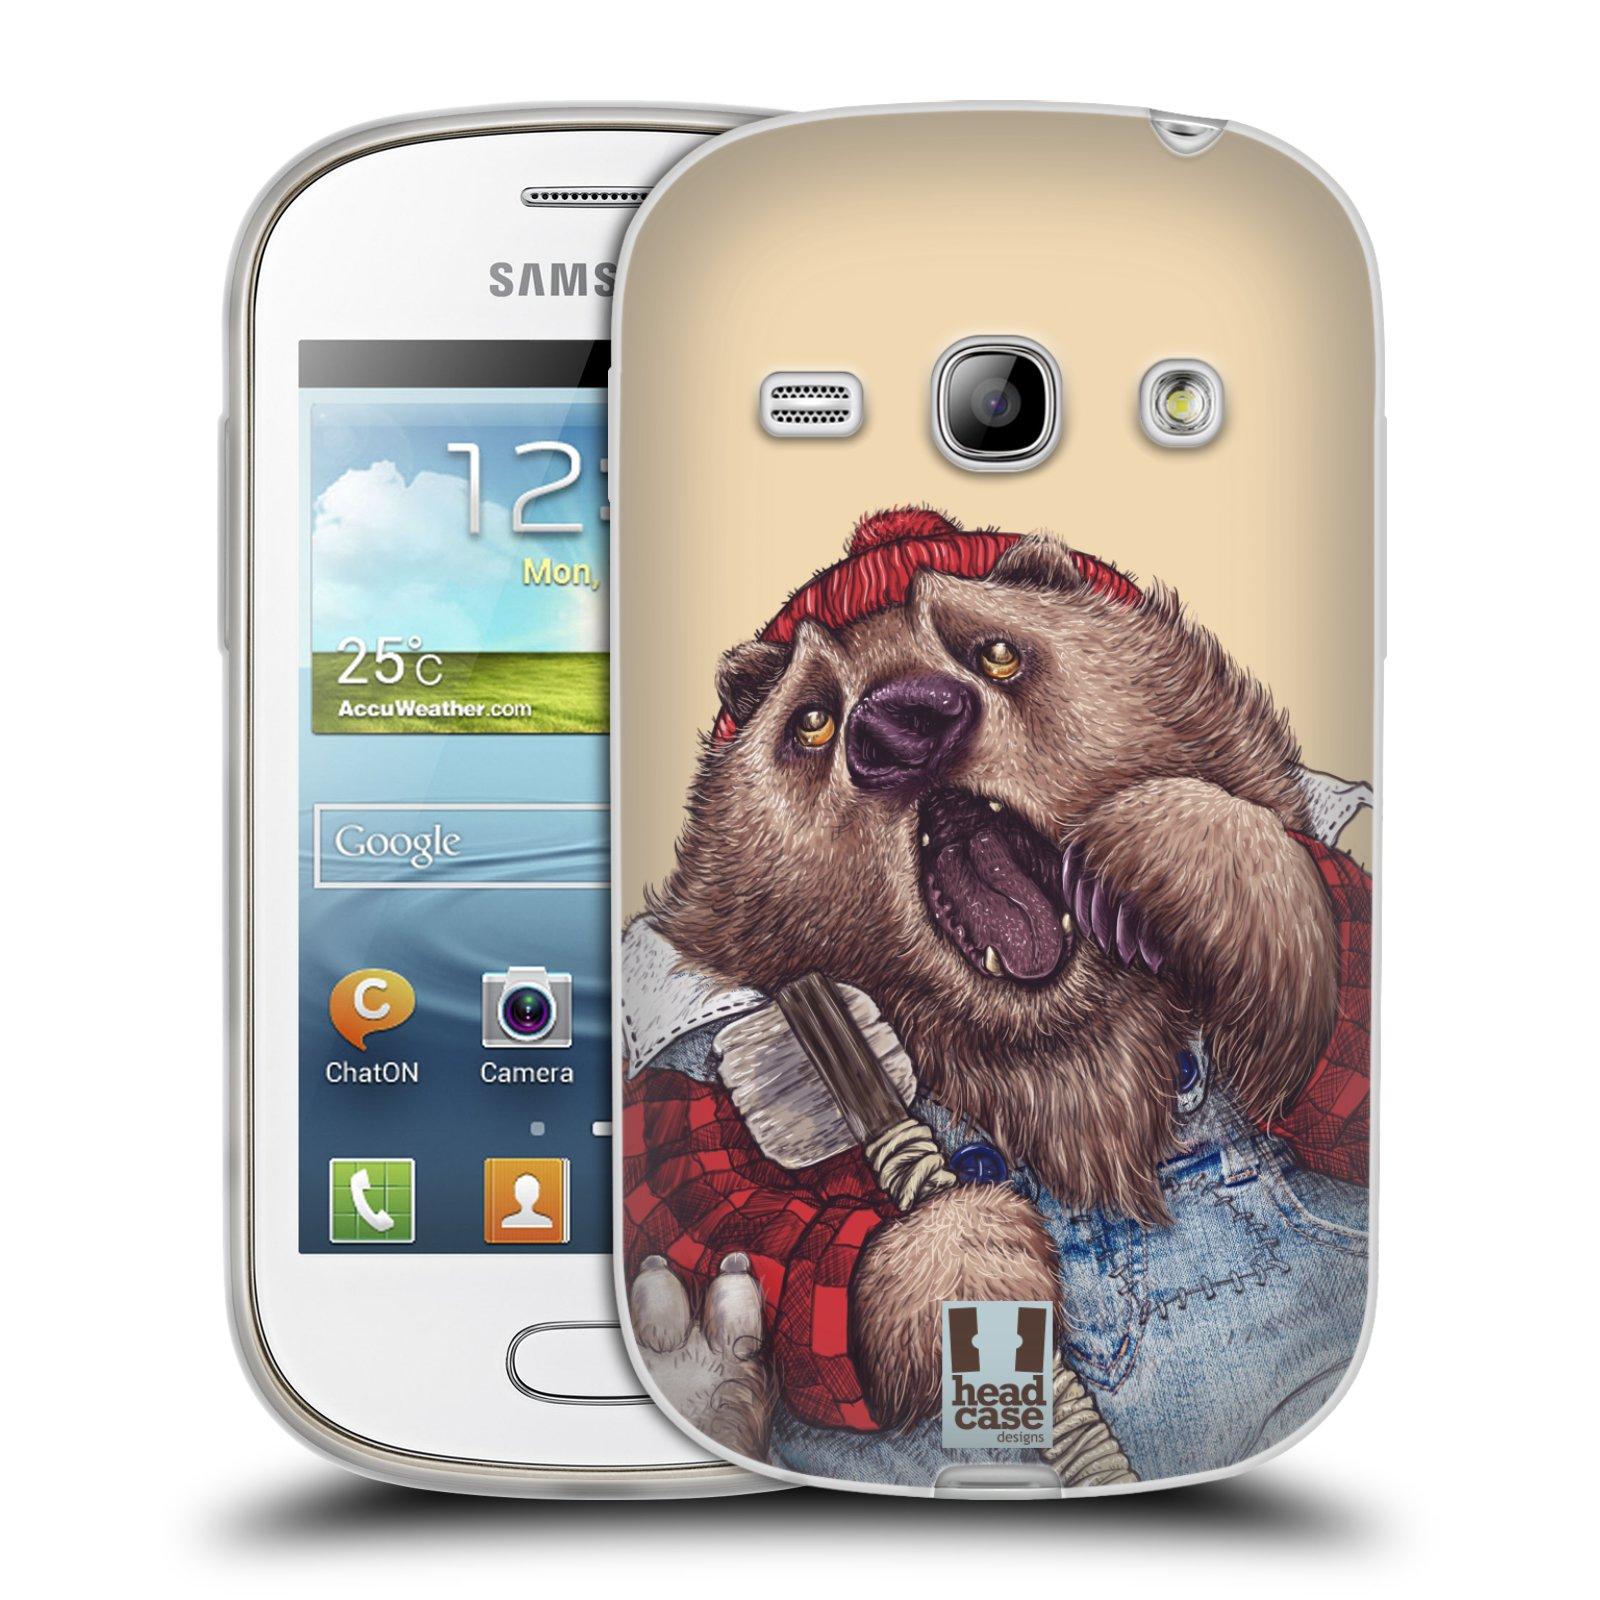 HEAD CASE silikonový obal na mobil Samsung Galaxy FAME vzor Kreslená zvířátka medvěd